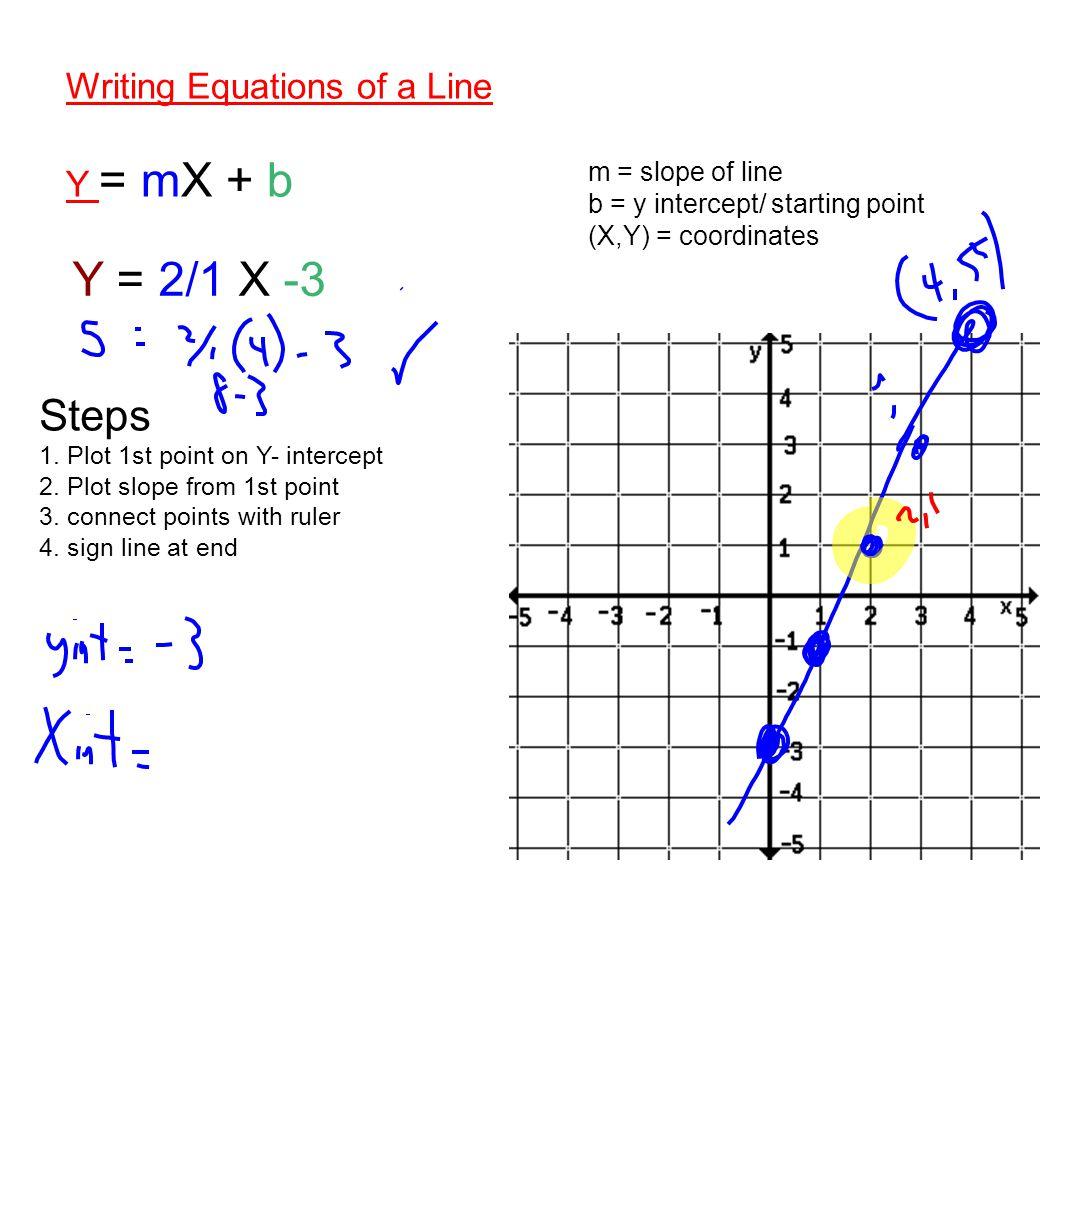 Y = 2/1 X -3 Steps Writing Equations of a Line Y = mX + b